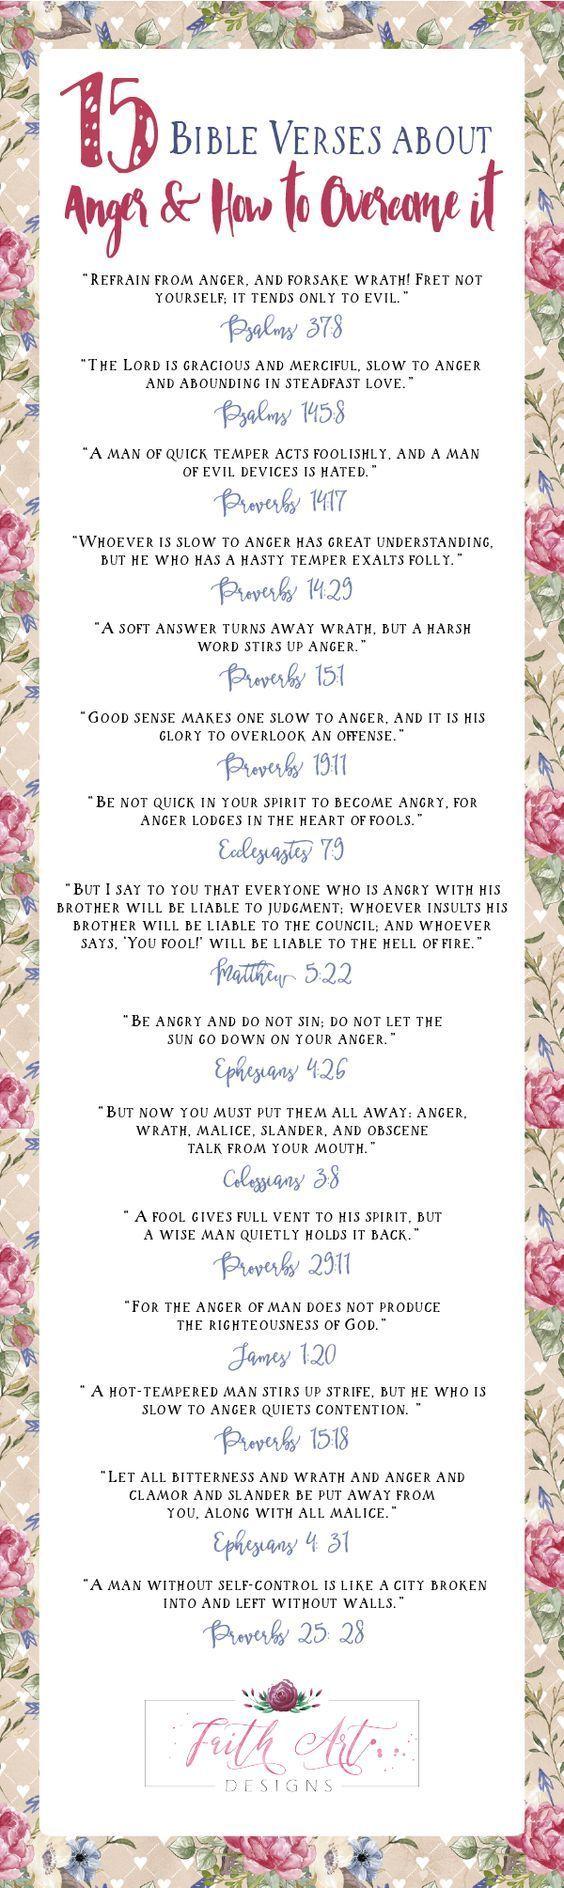 270 Best Bible Verses Images On Pinterest Bible Art Bible Psalms